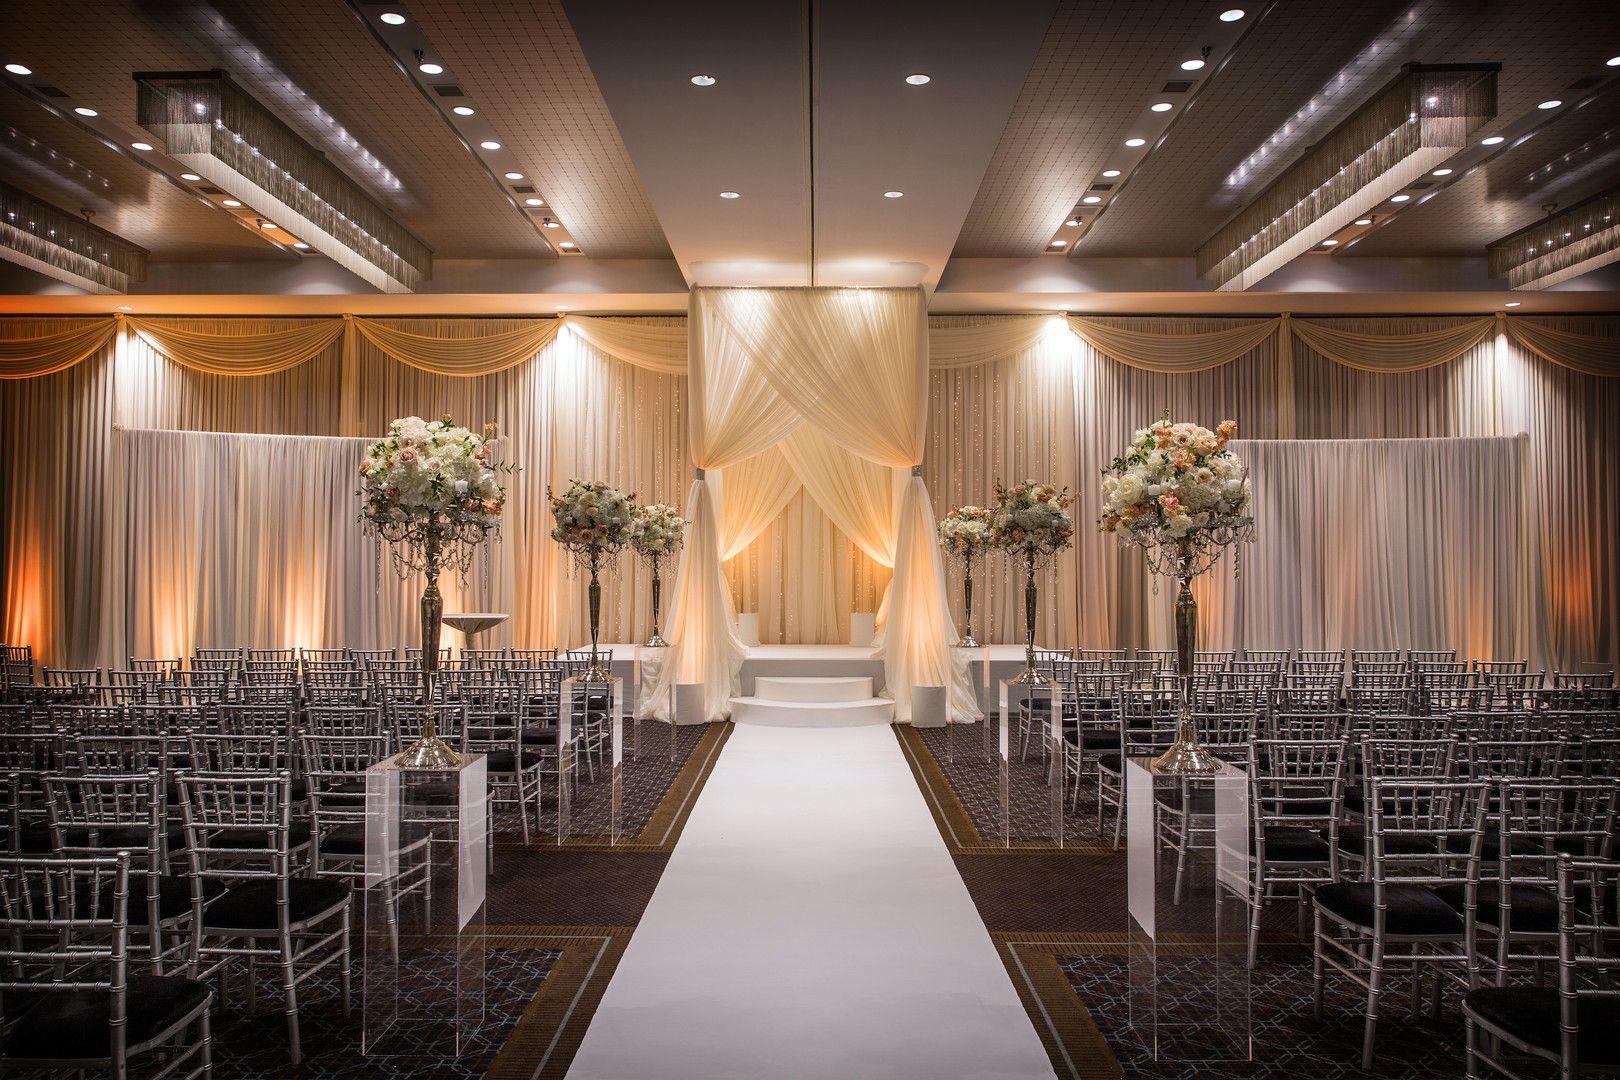 Luxurious Winter Wedding At Hotel Arista In Naperville Il Captured By Jason Kaczorowski Photography See M Winter Wedding Wedding Ceremony Decorations Wedding